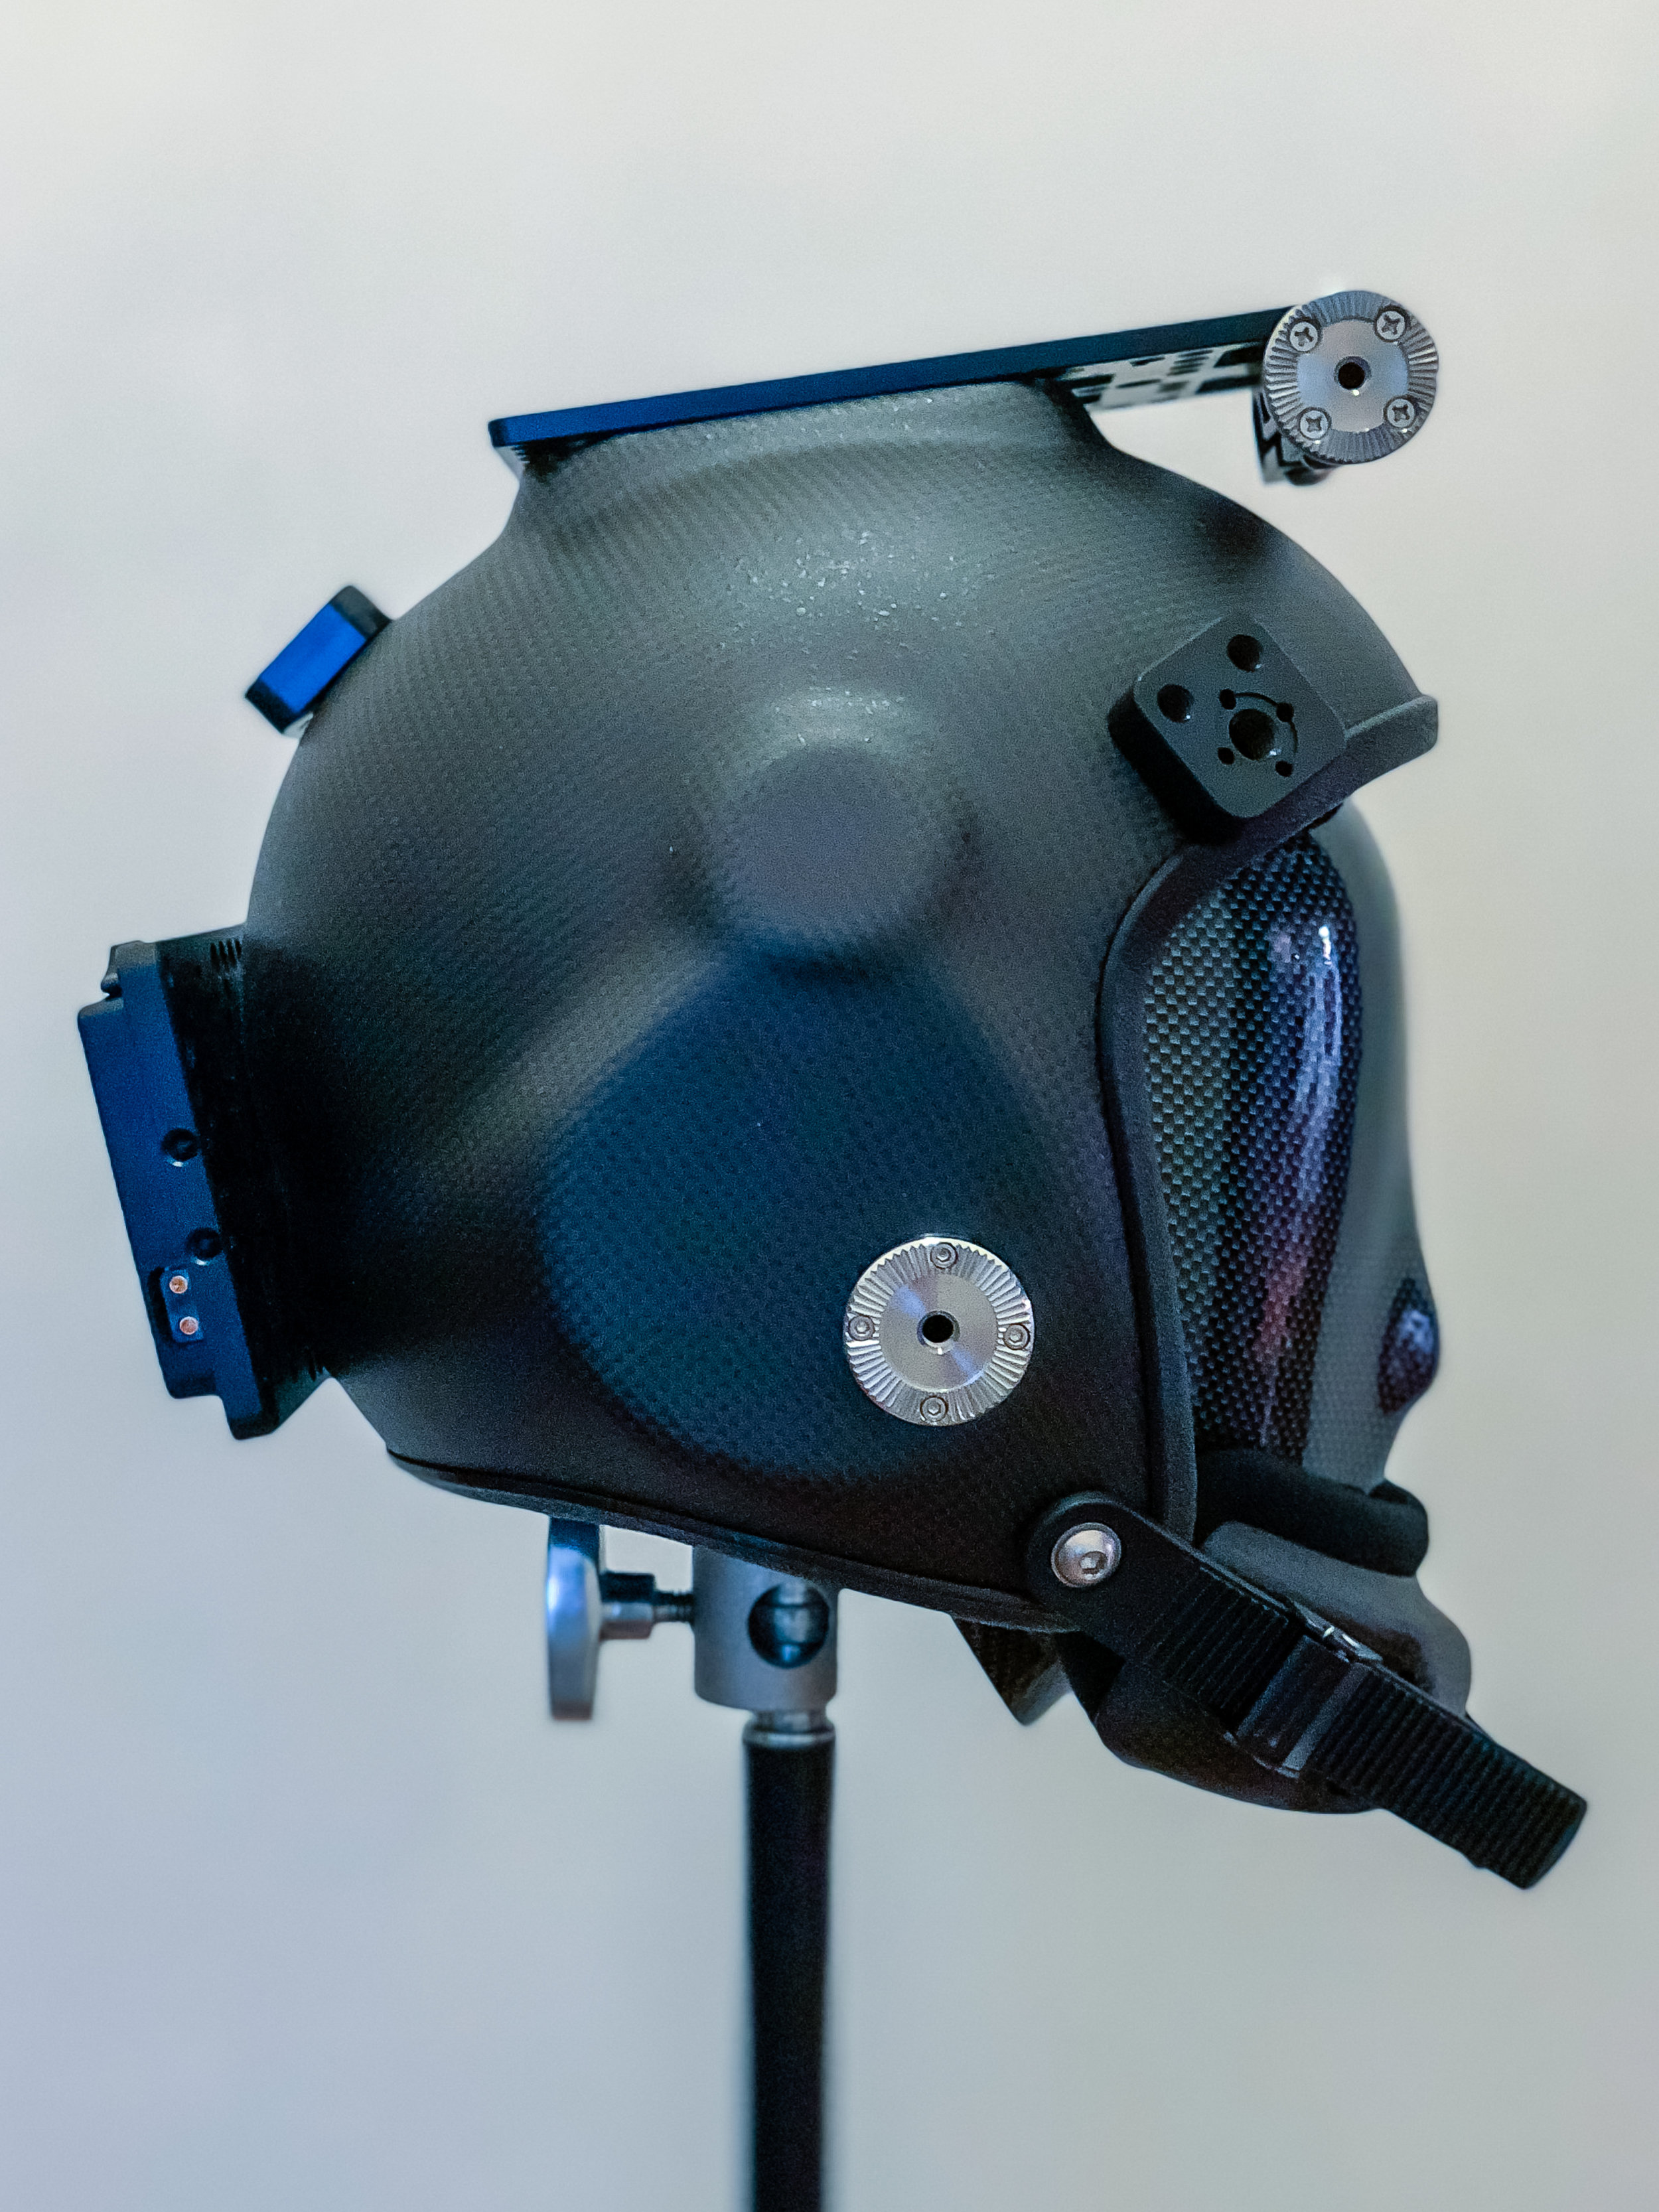 Right side of helmet